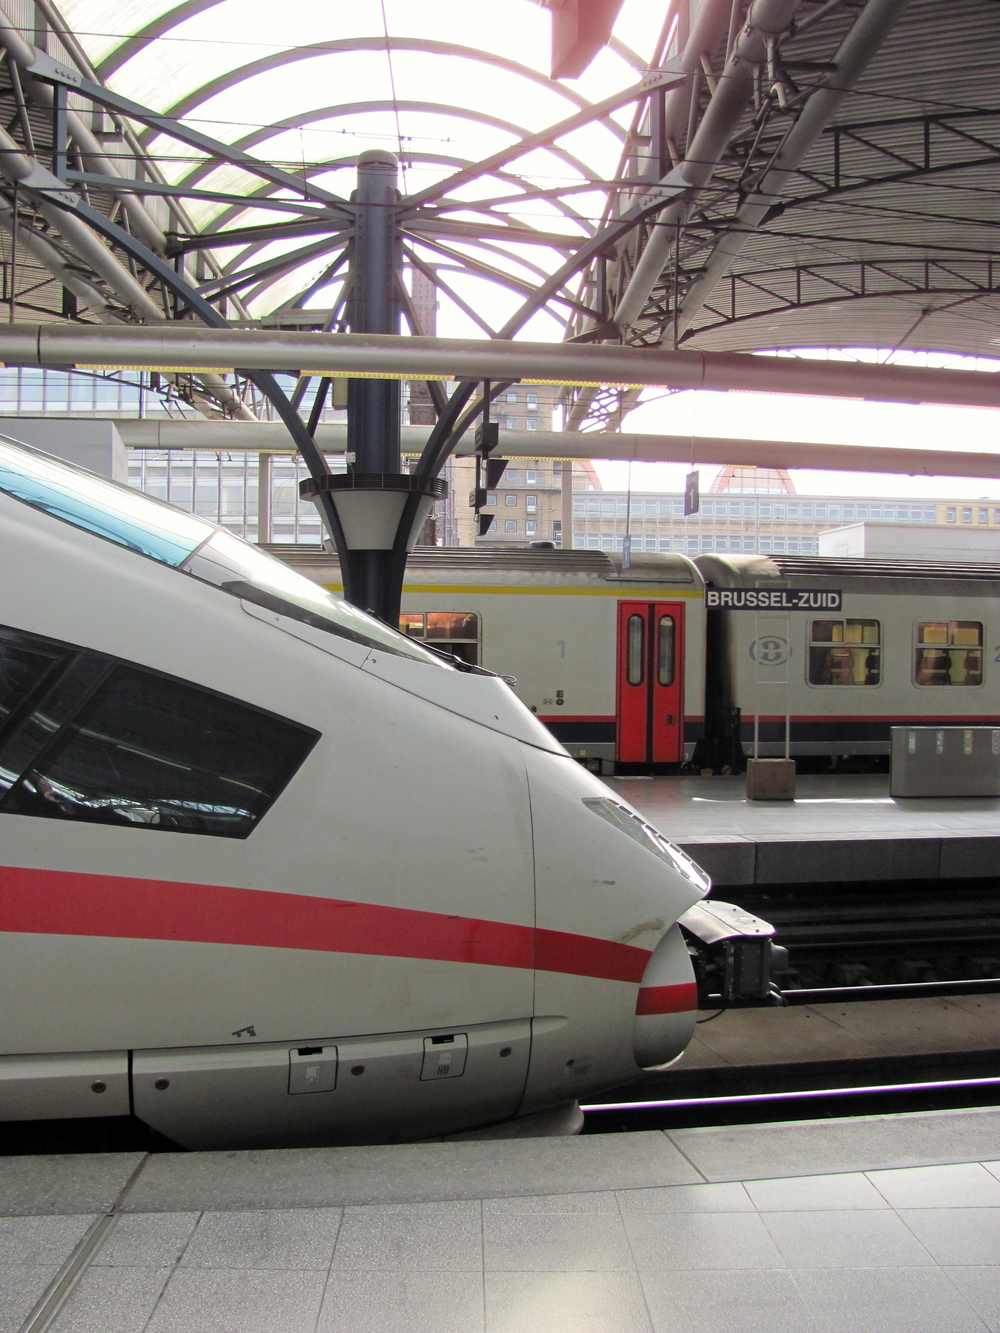 Gore Du Midi Zuidstation, Brussels, Belgium, VHS 2010